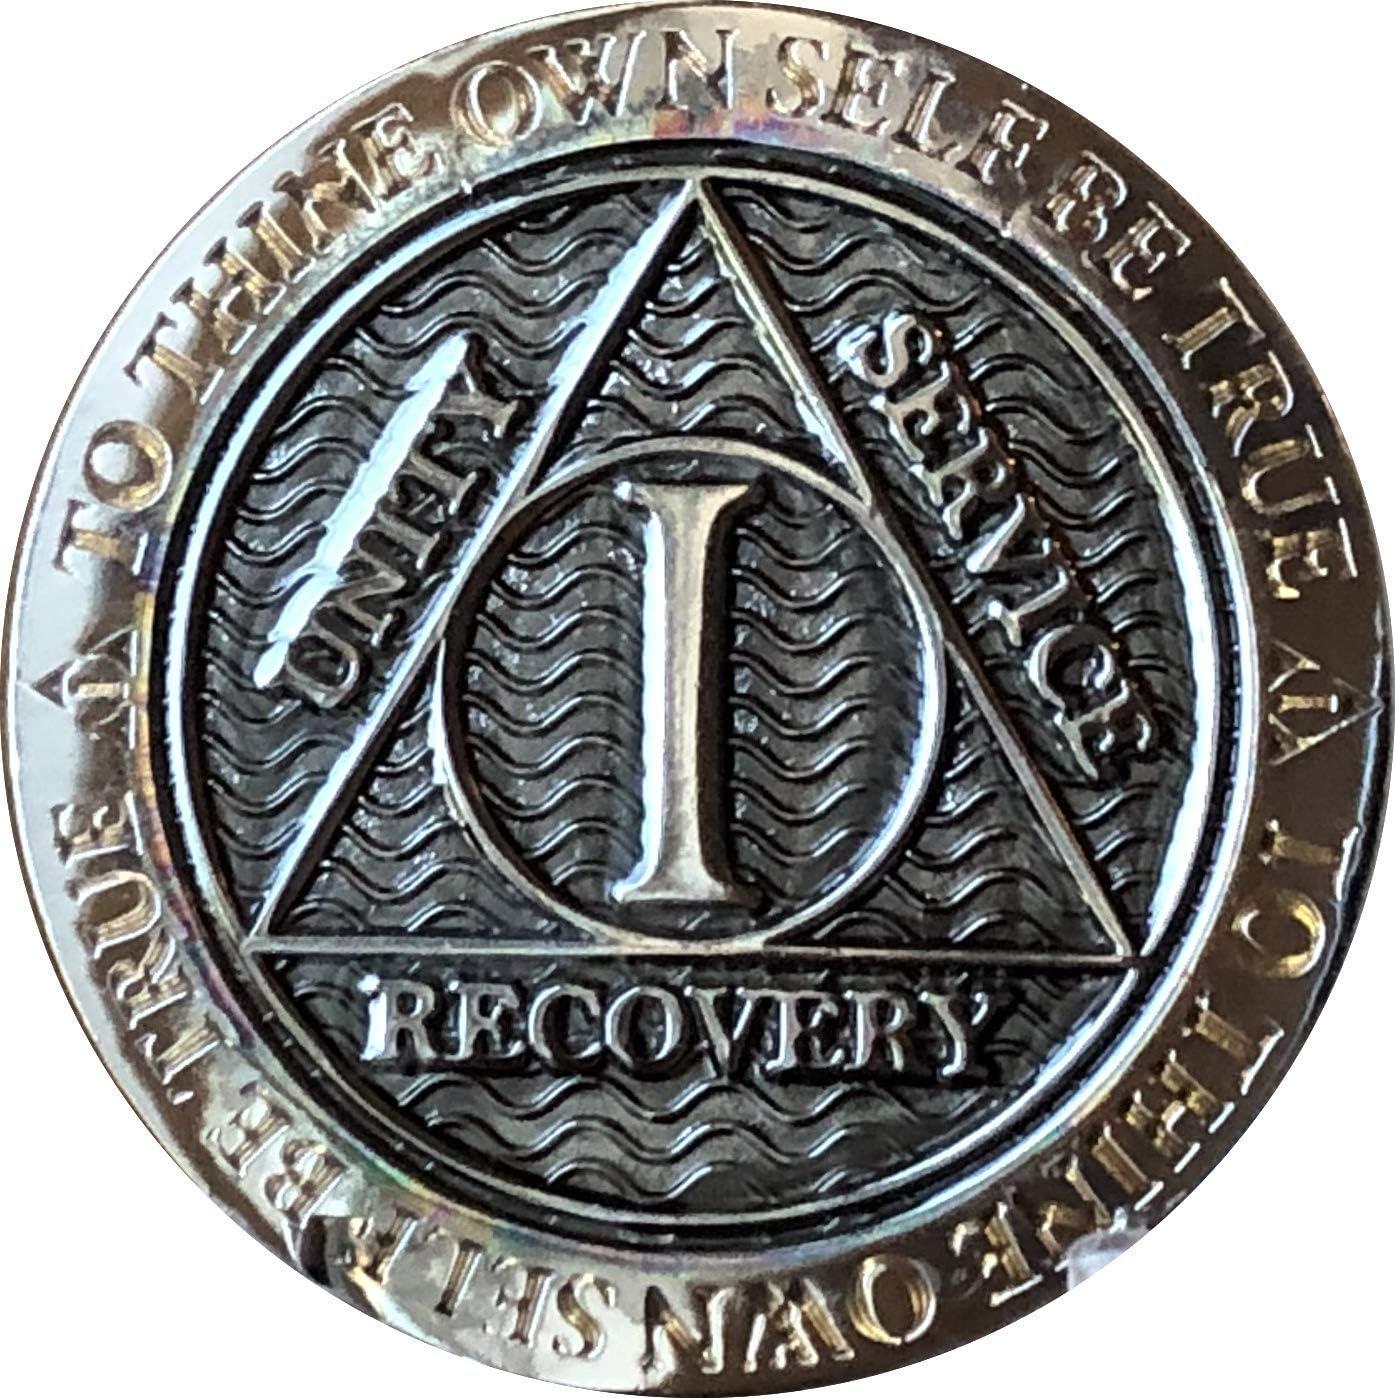 1 Fees free Year AA Max 74% OFF Medallion Gunmetal Prayer Serenity Reflex Chip Design